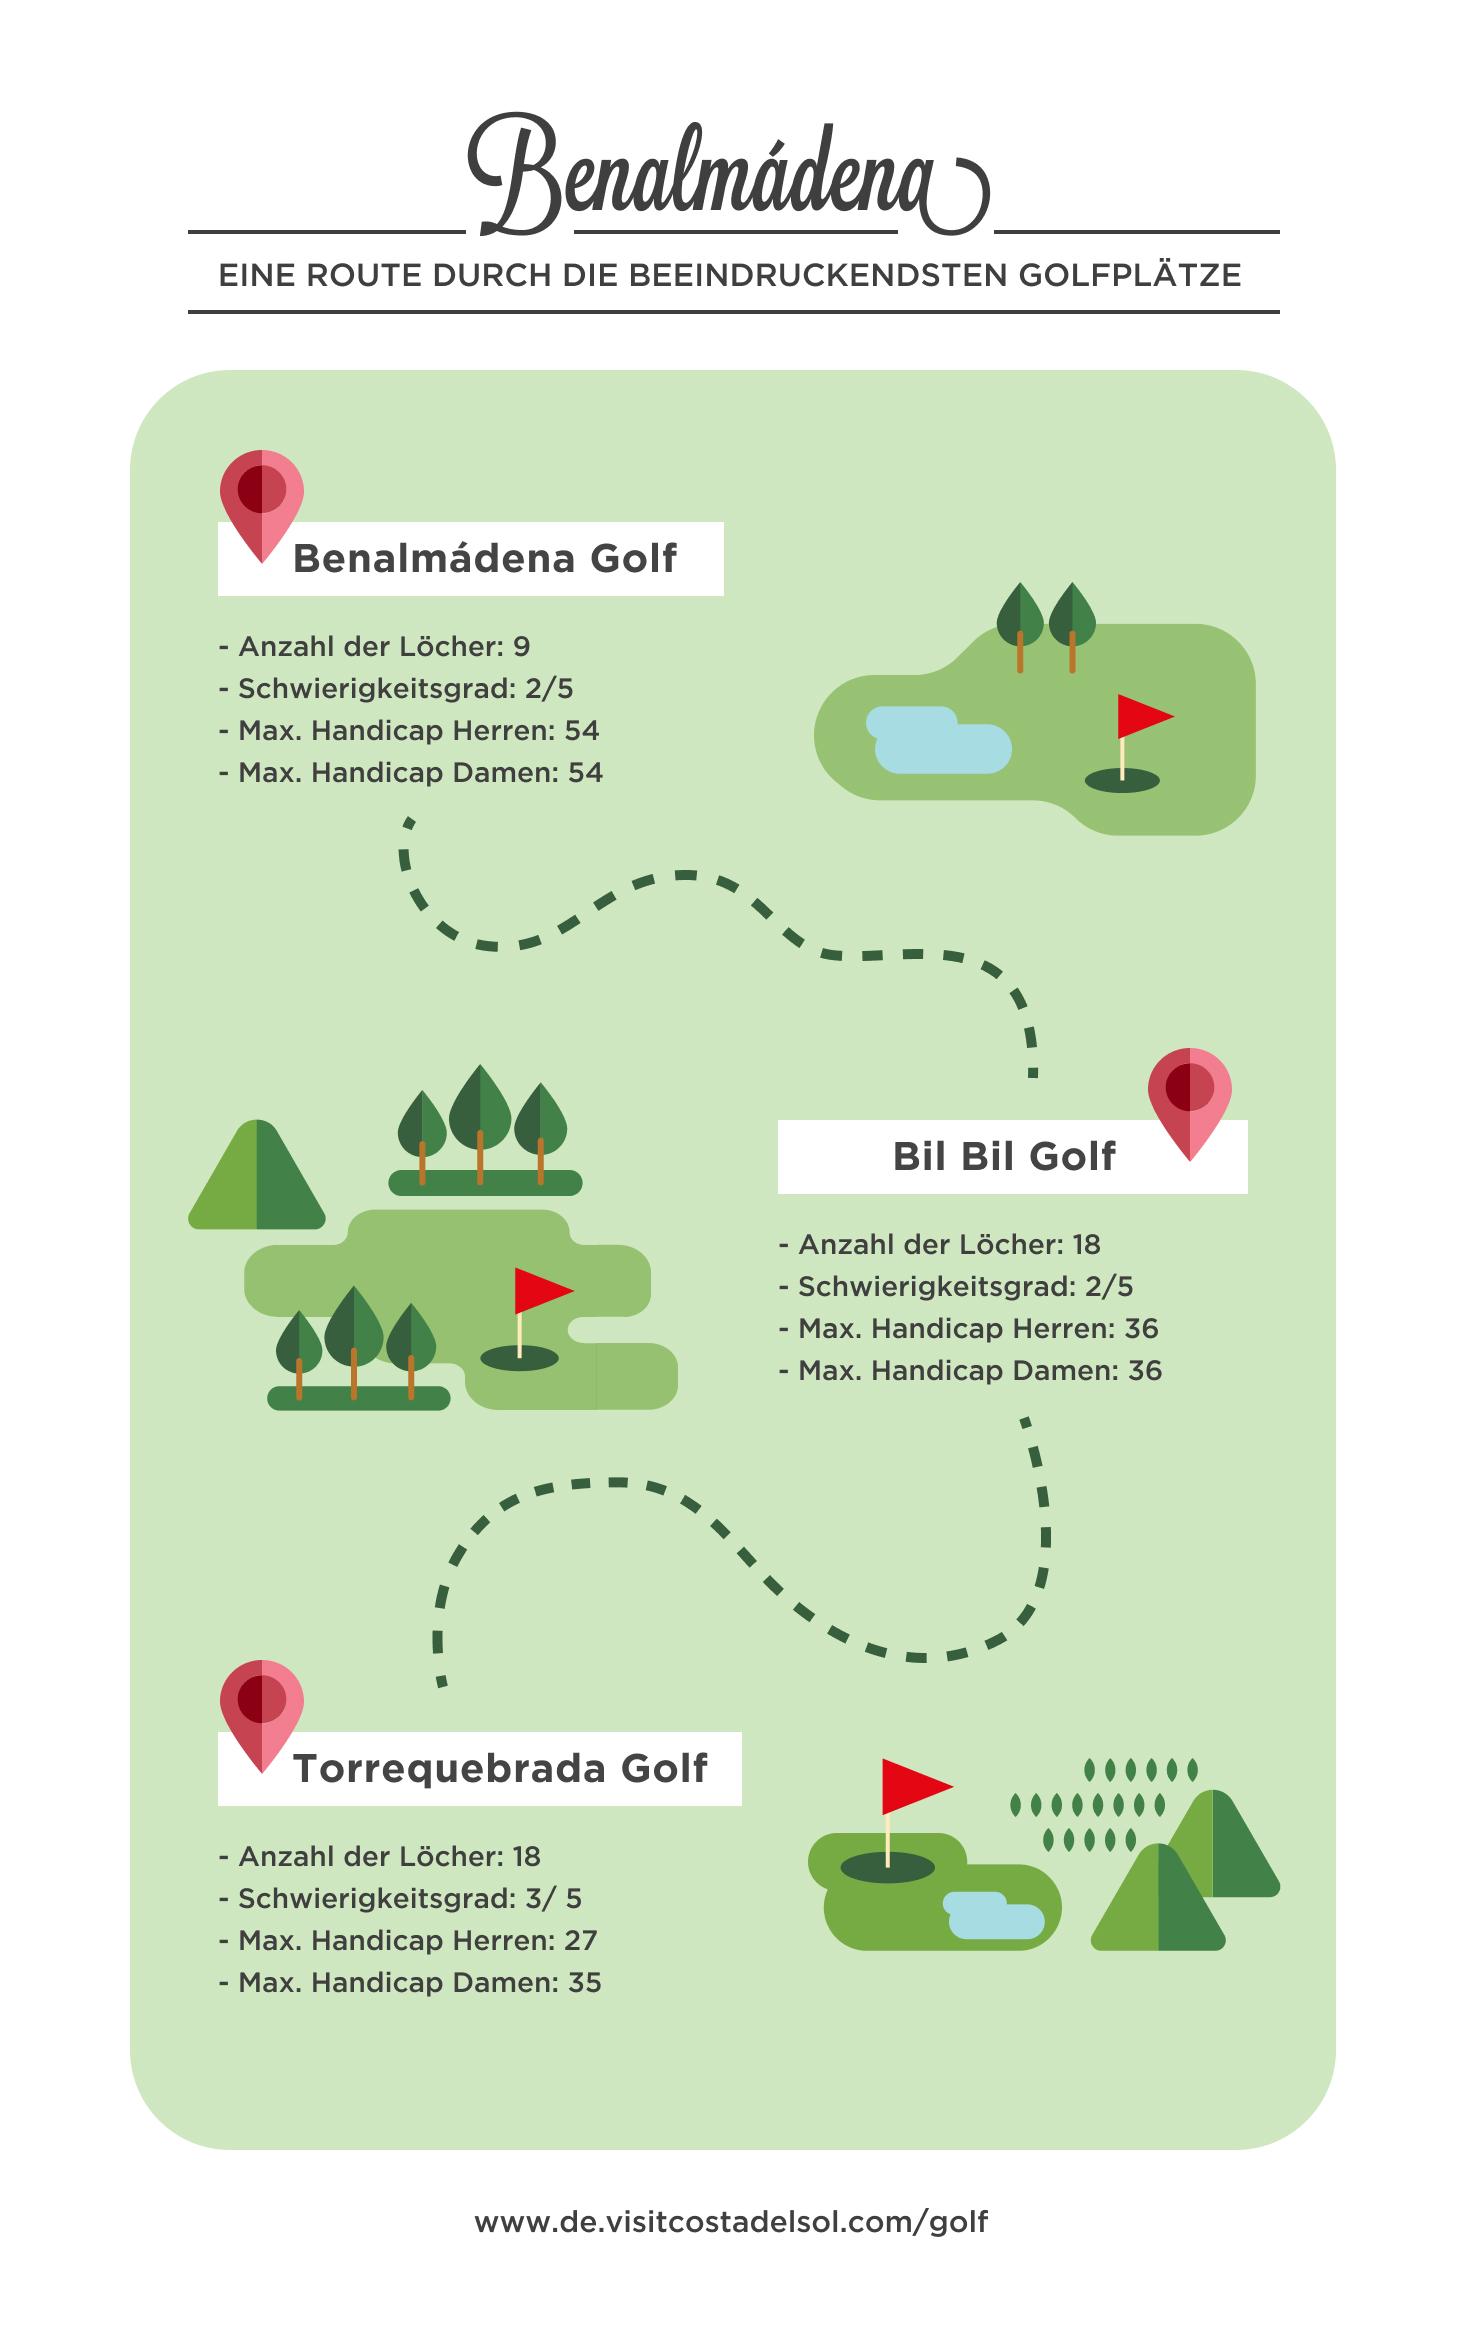 Benalmádena golf